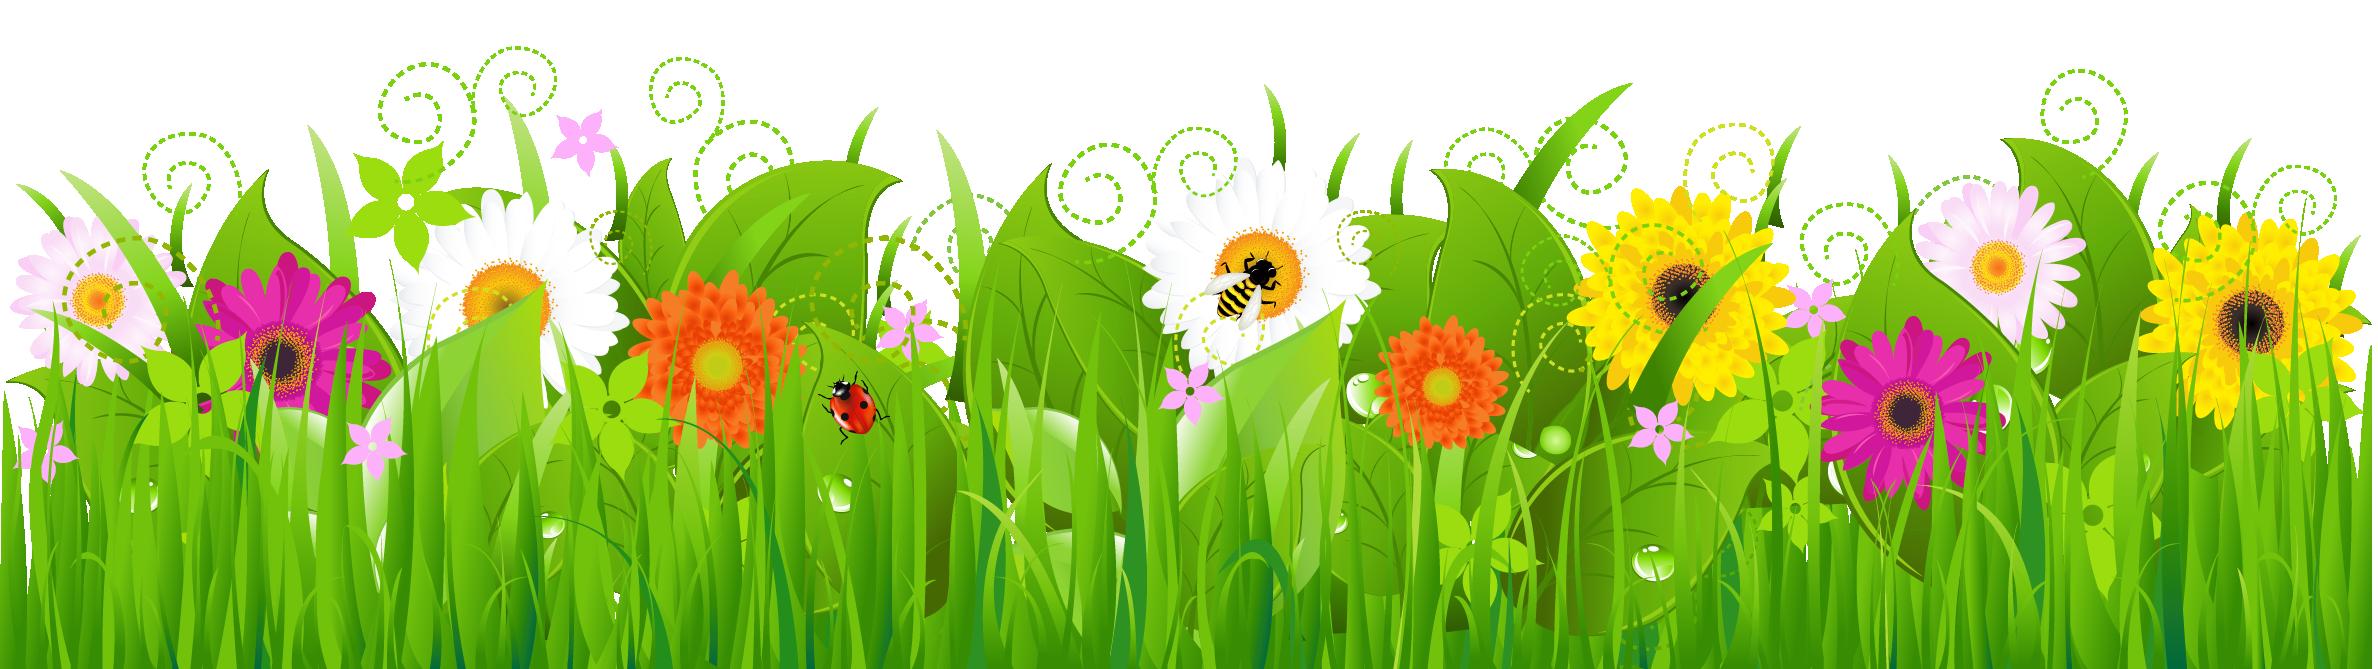 medium resolution of clip art grass clipart cliparts for you clipartix 2